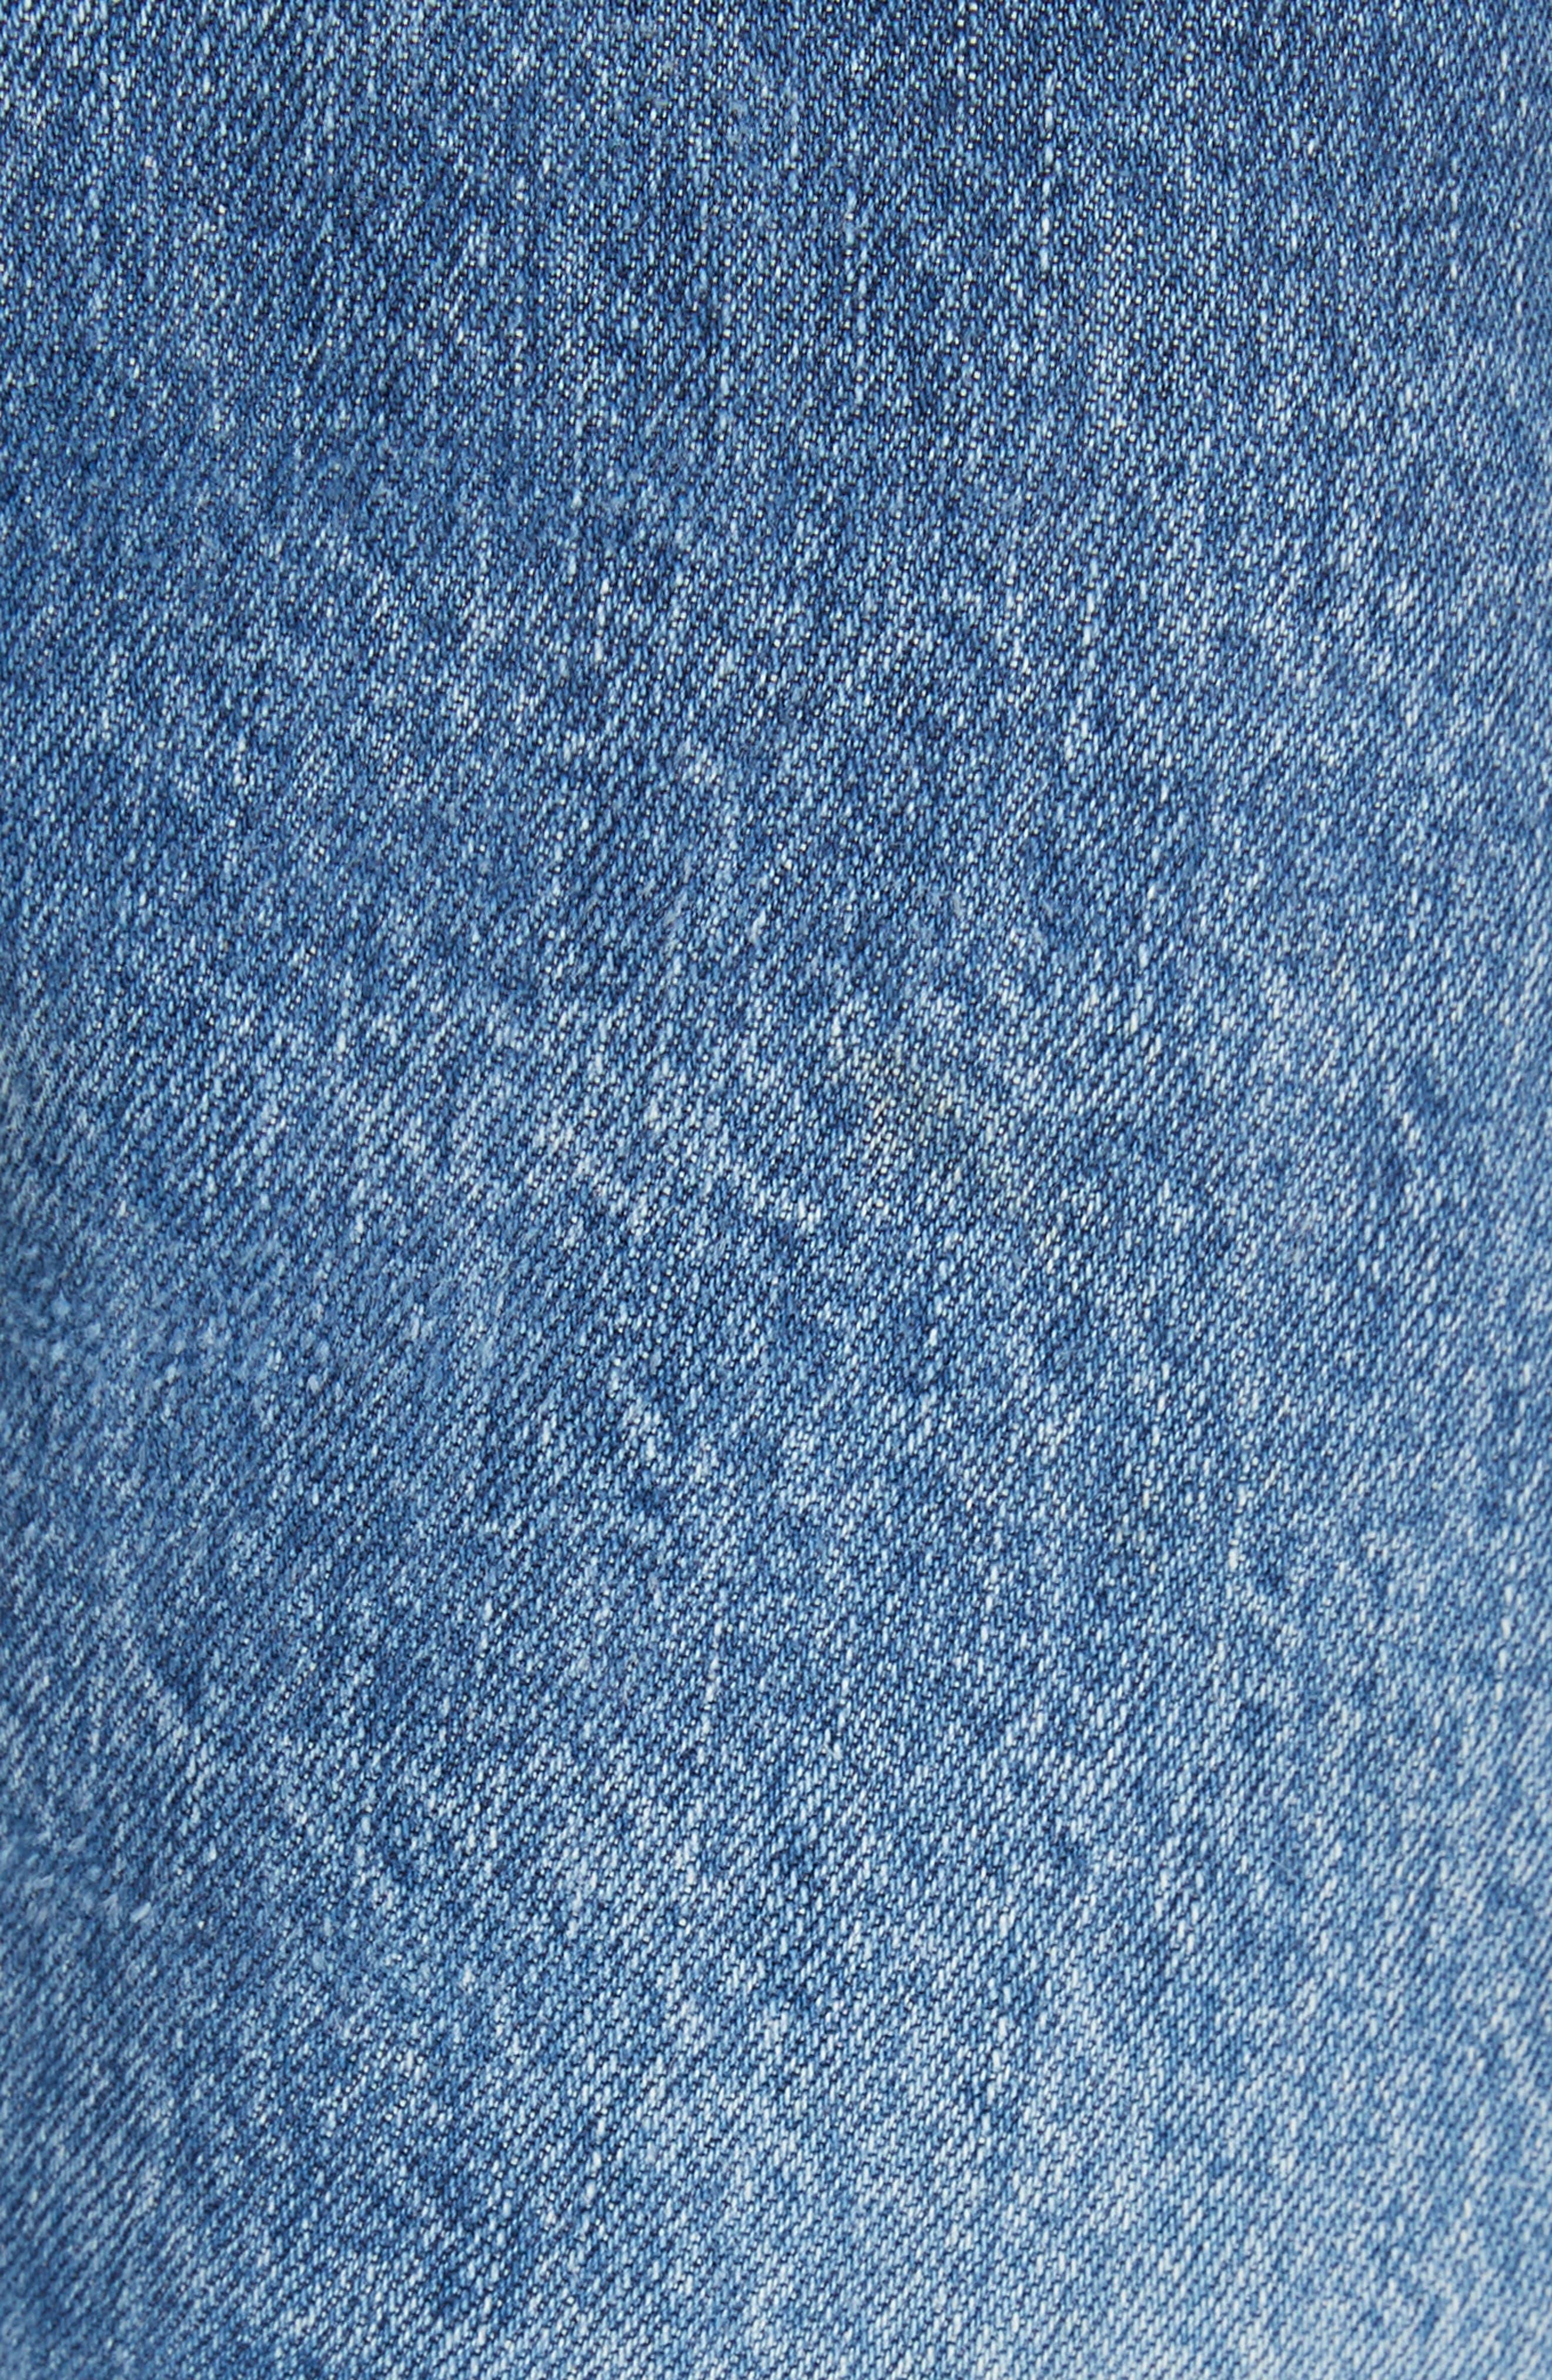 High Waist Stovepipe Jeans,                             Alternate thumbnail 5, color,                             INDIGO